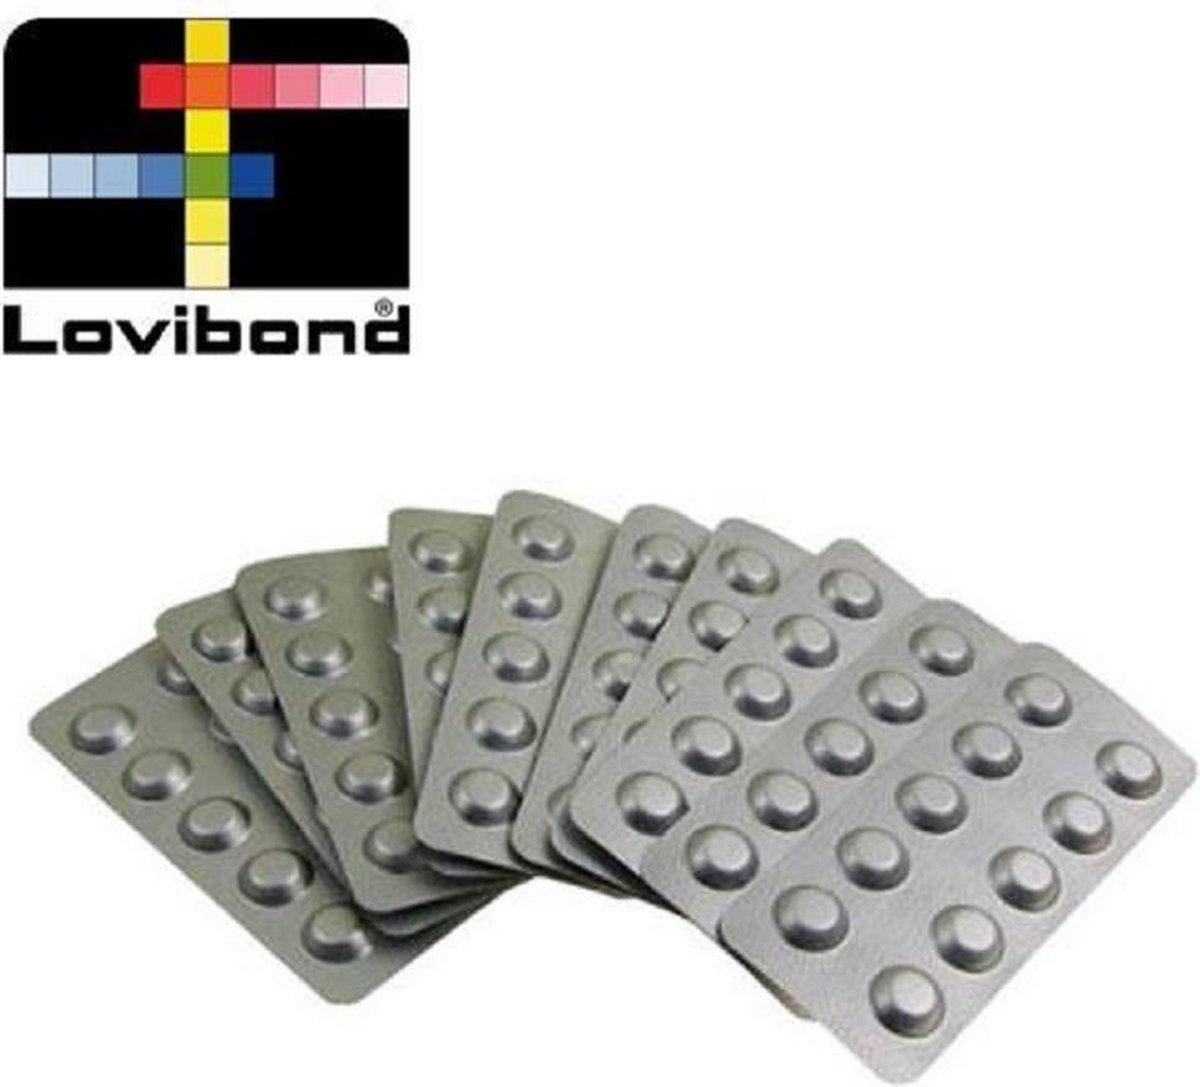 Testtabletten totaal chloor (DPD3), 100 stuks (Lovibond)